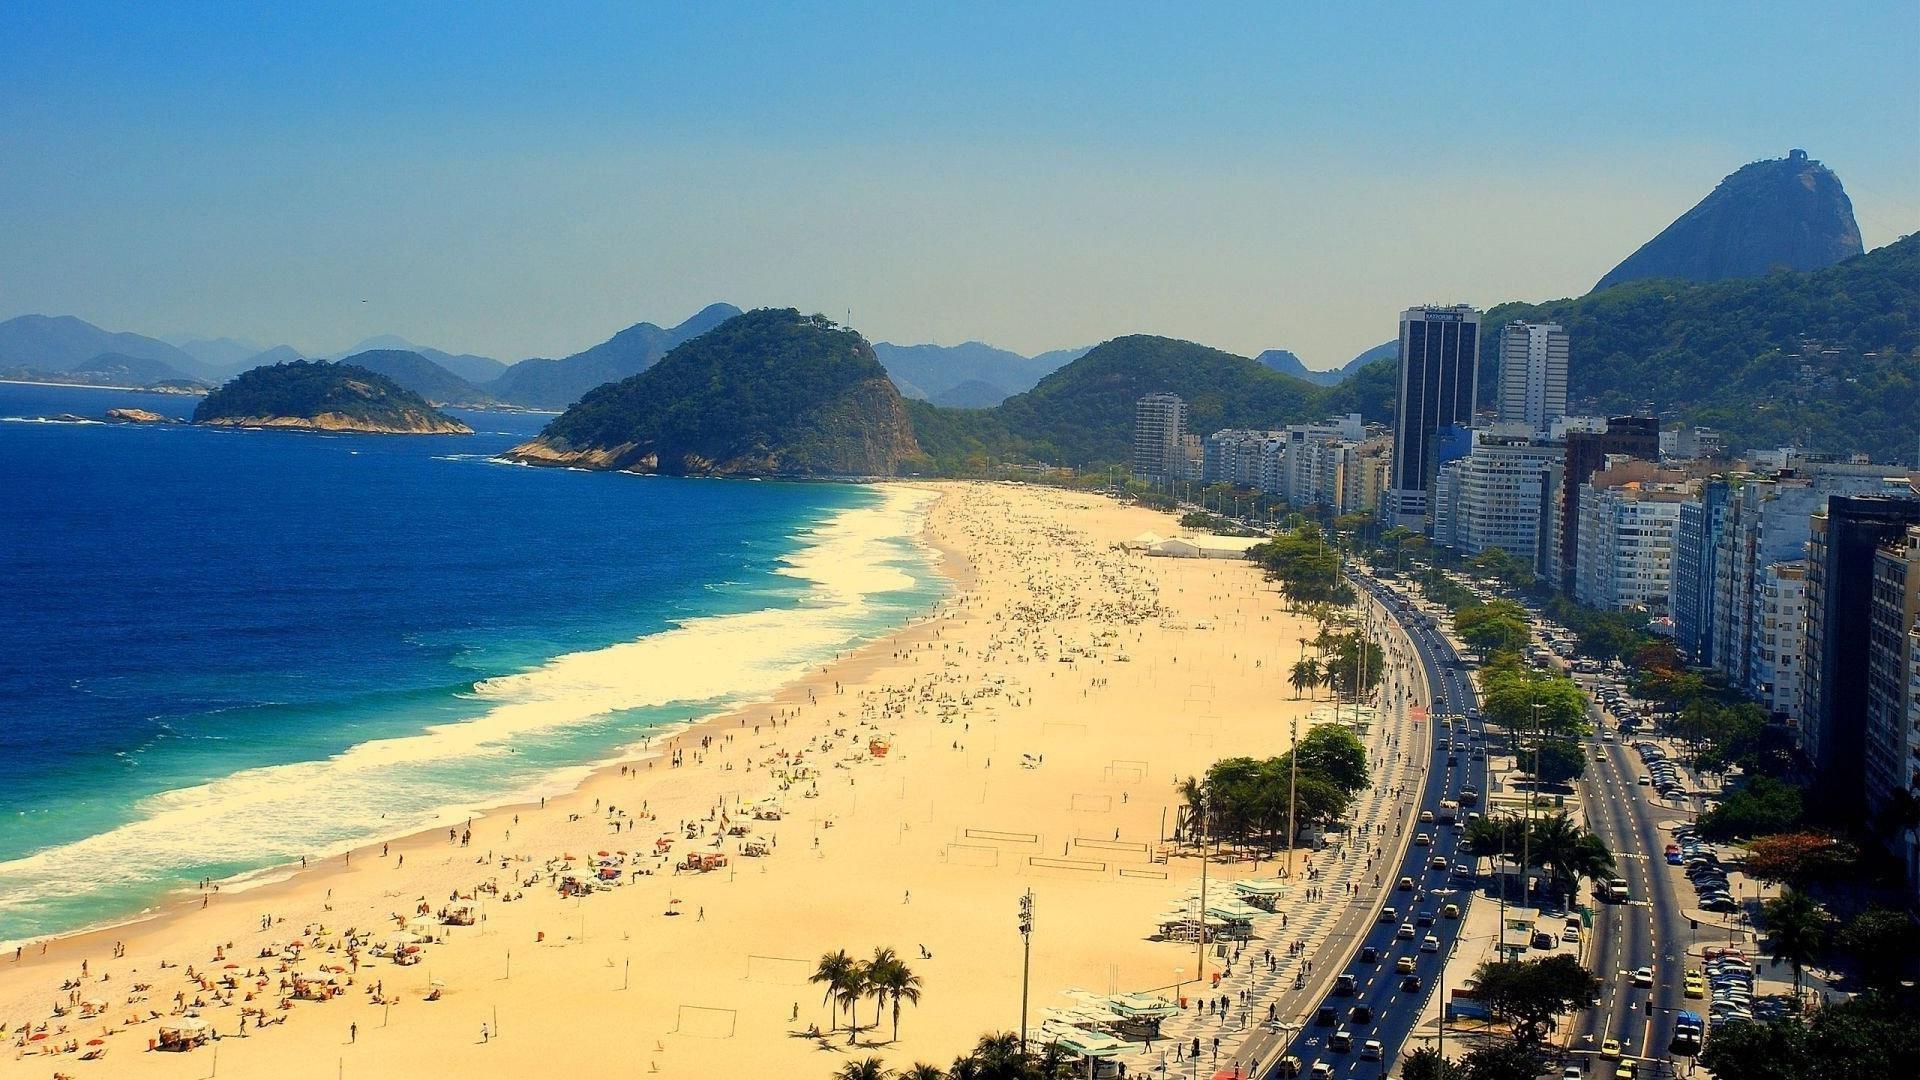 Playa Copacabana Brasil Rio Janeiro Oceano Wallpaper